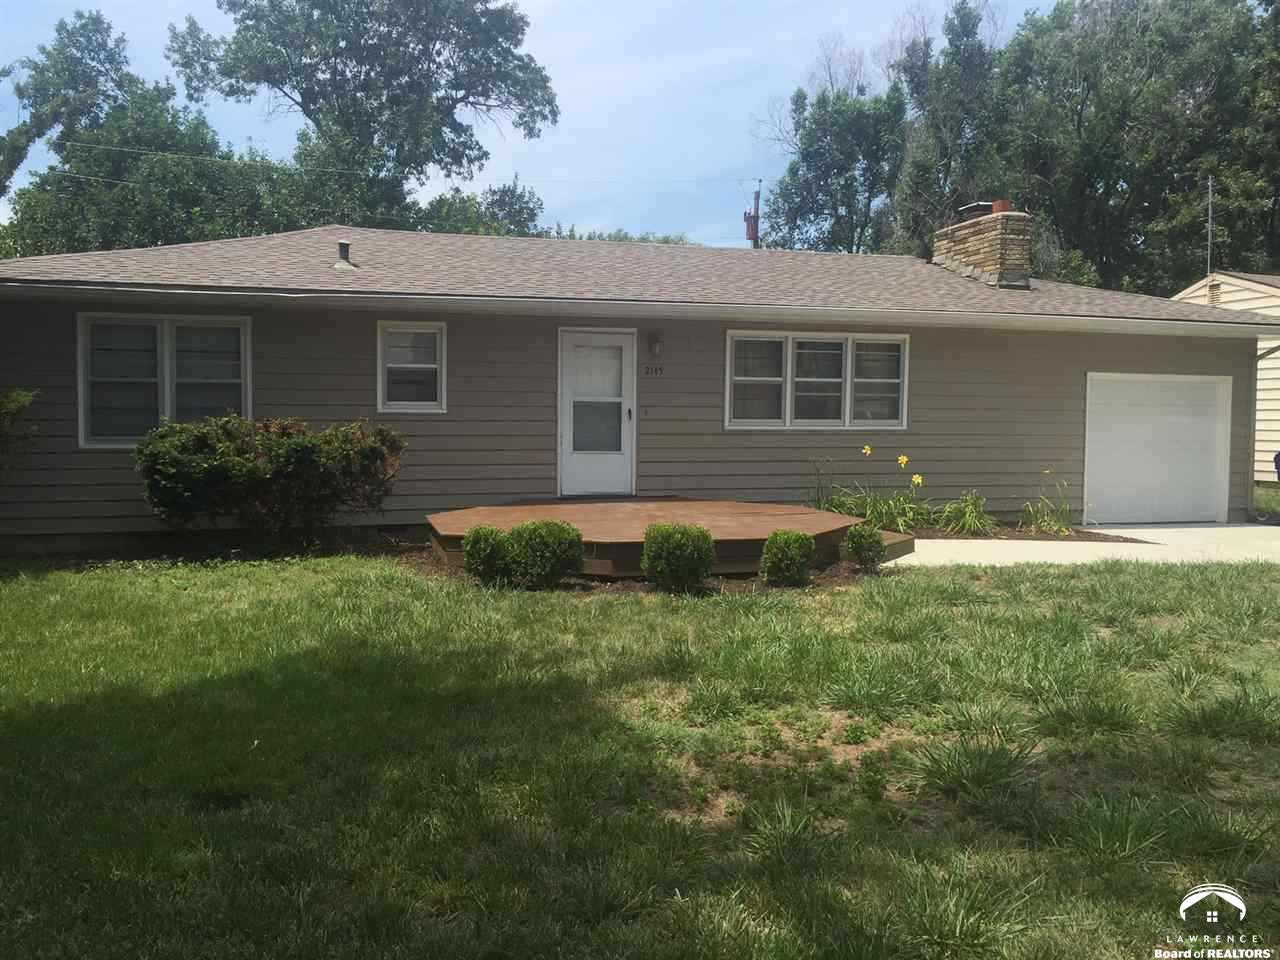 2145 Mitchell Rd, Lawrence, KS 66046